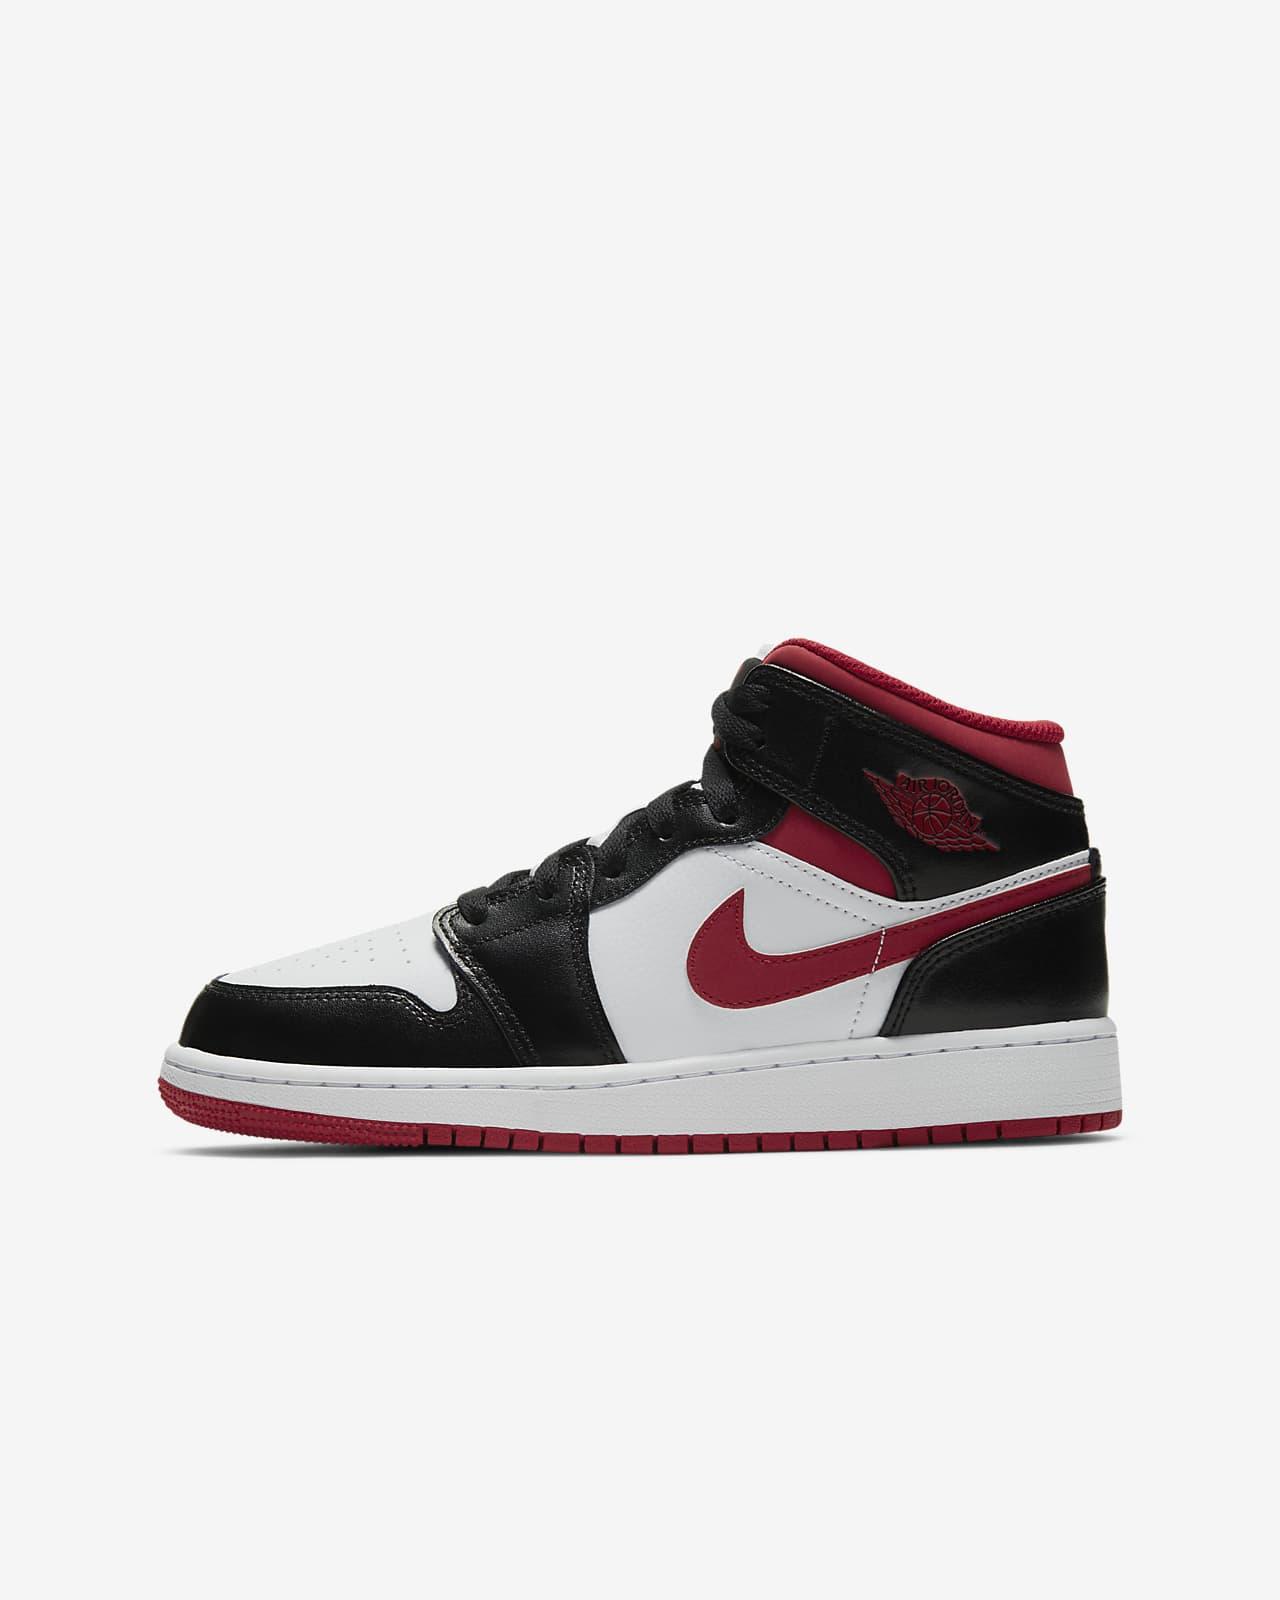 Air Jordan 1 Mid Older Kids' Shoe. Nike LU